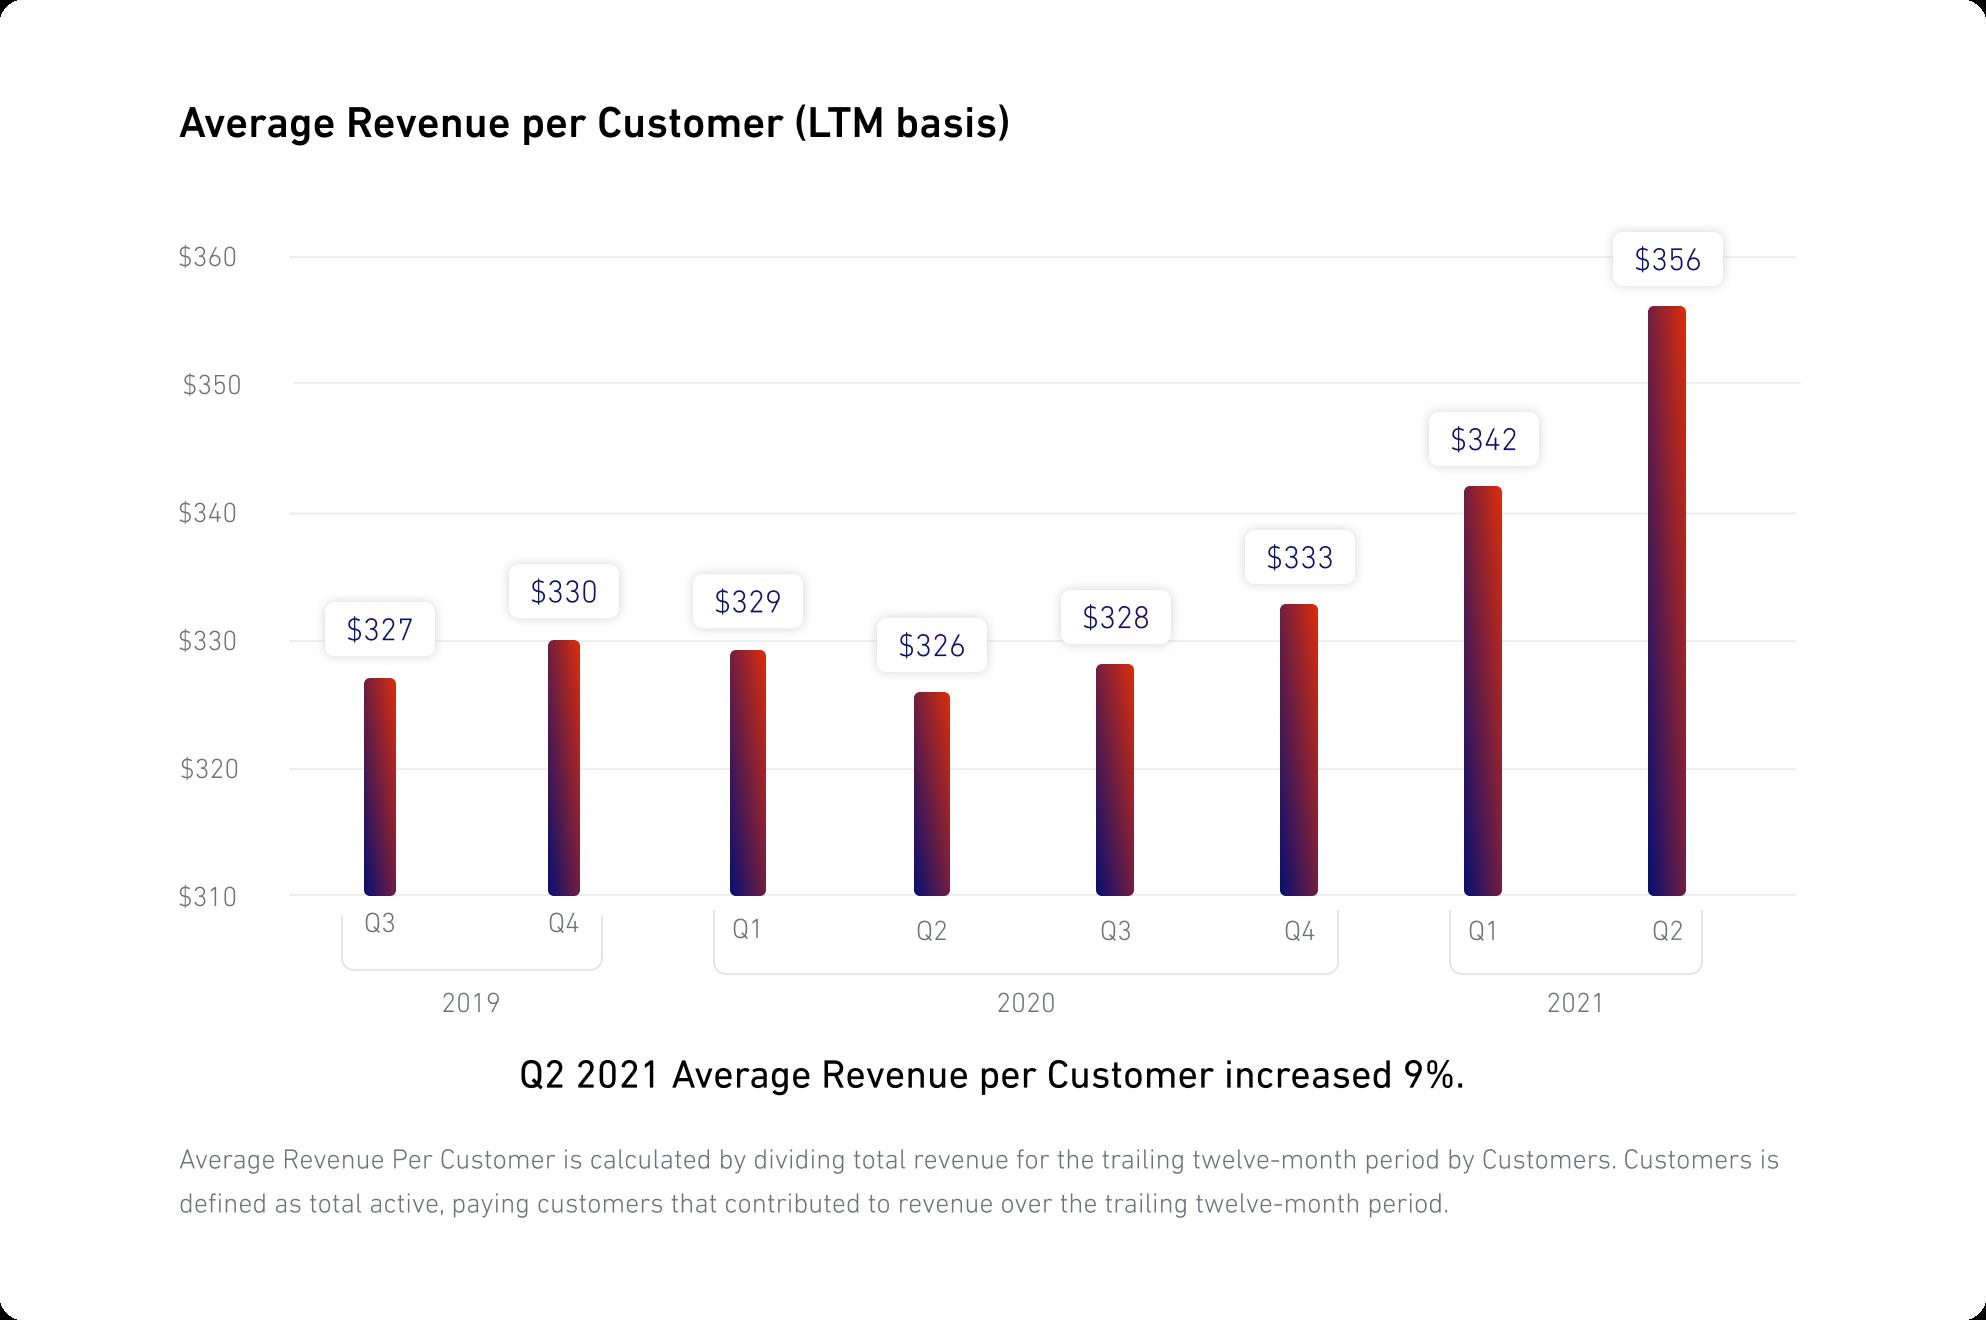 Average Revenue Per Customer (LTM basis)